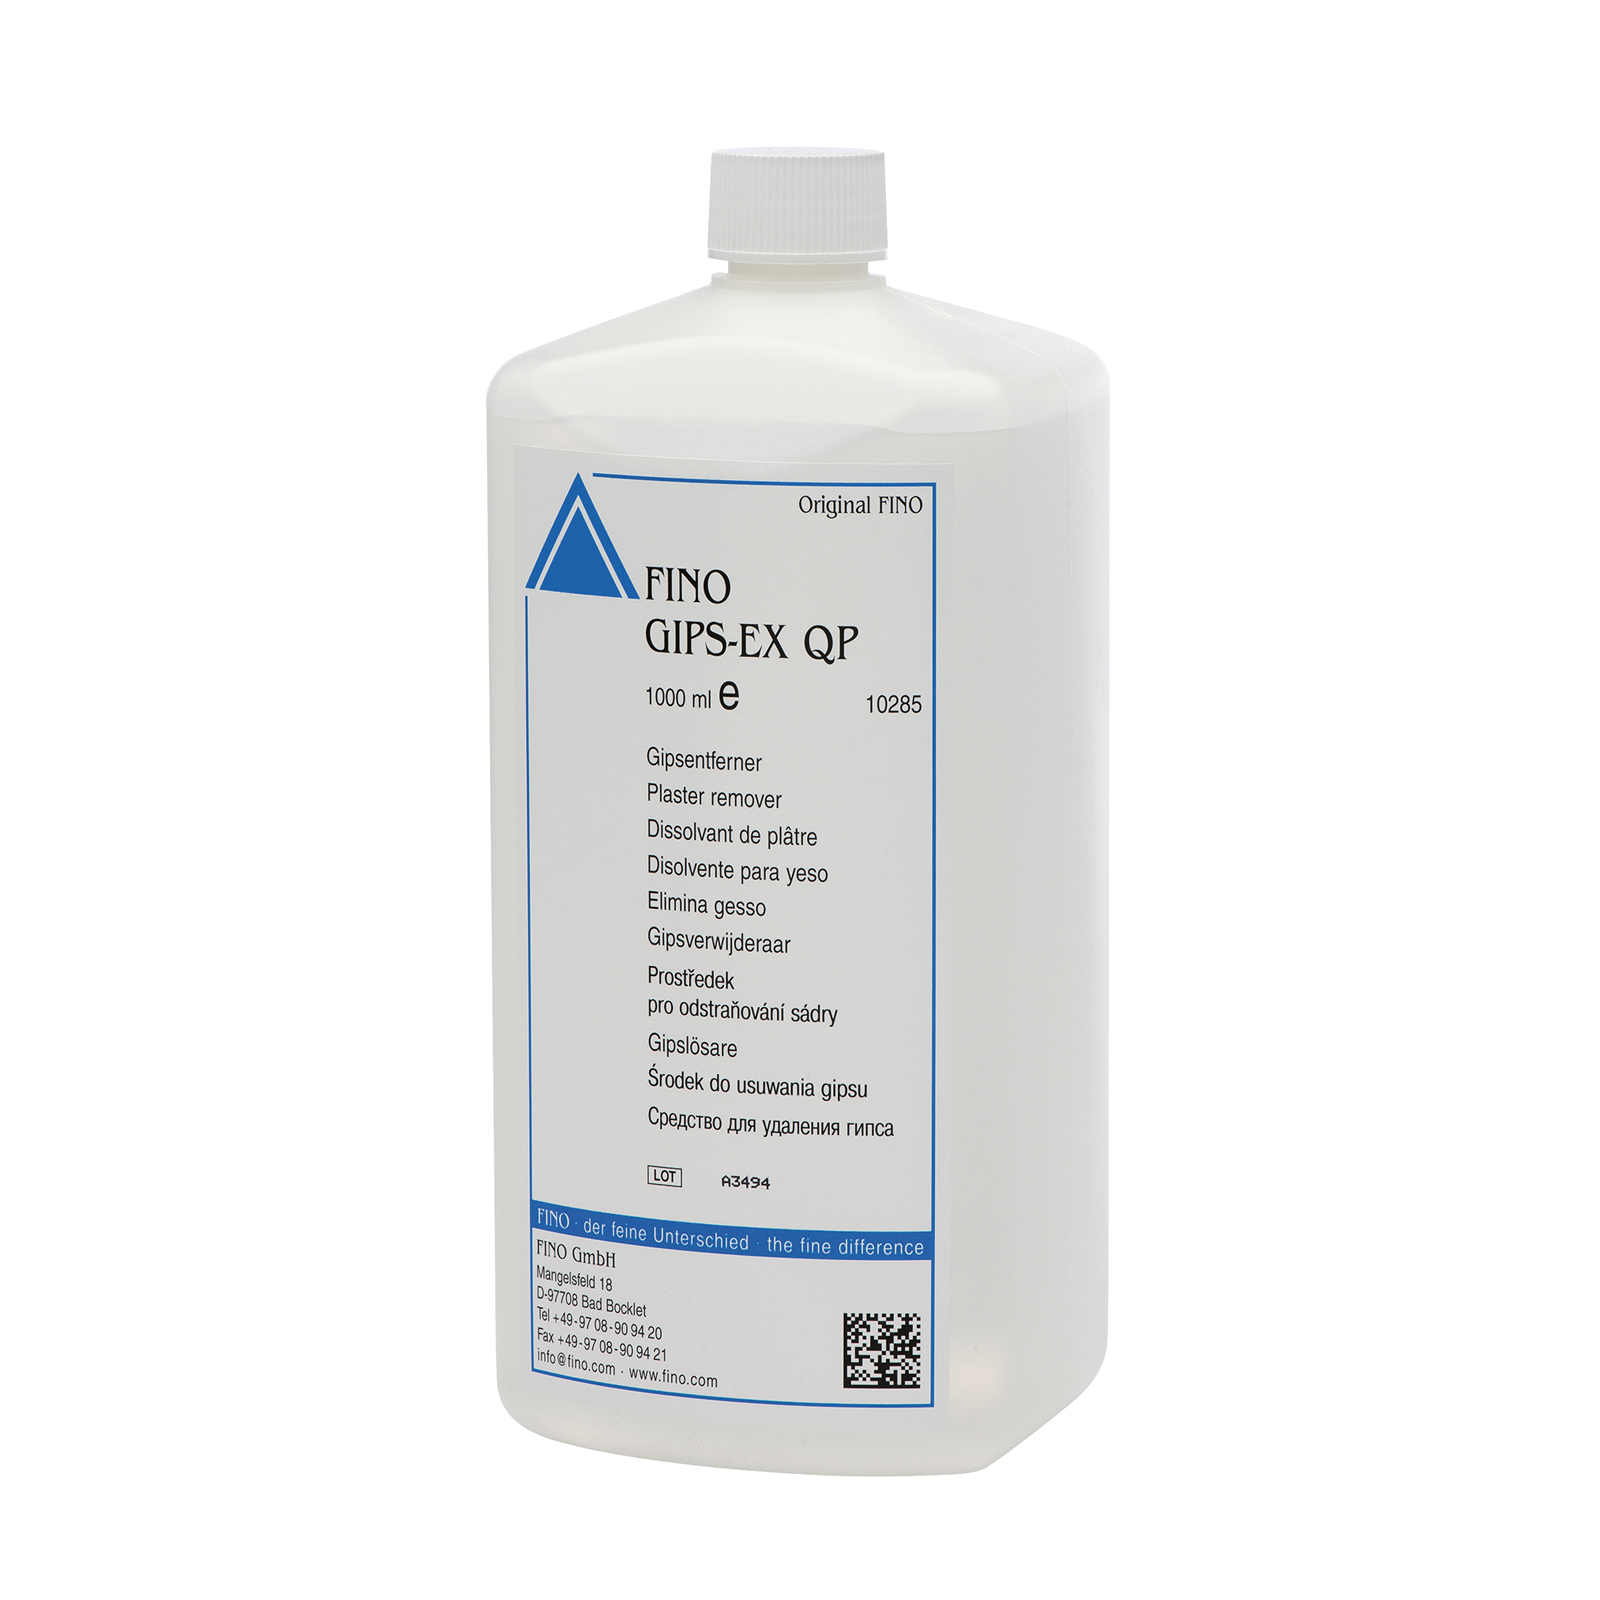 FINO GIPS-EX QP Plaster Remover - 1000 ml